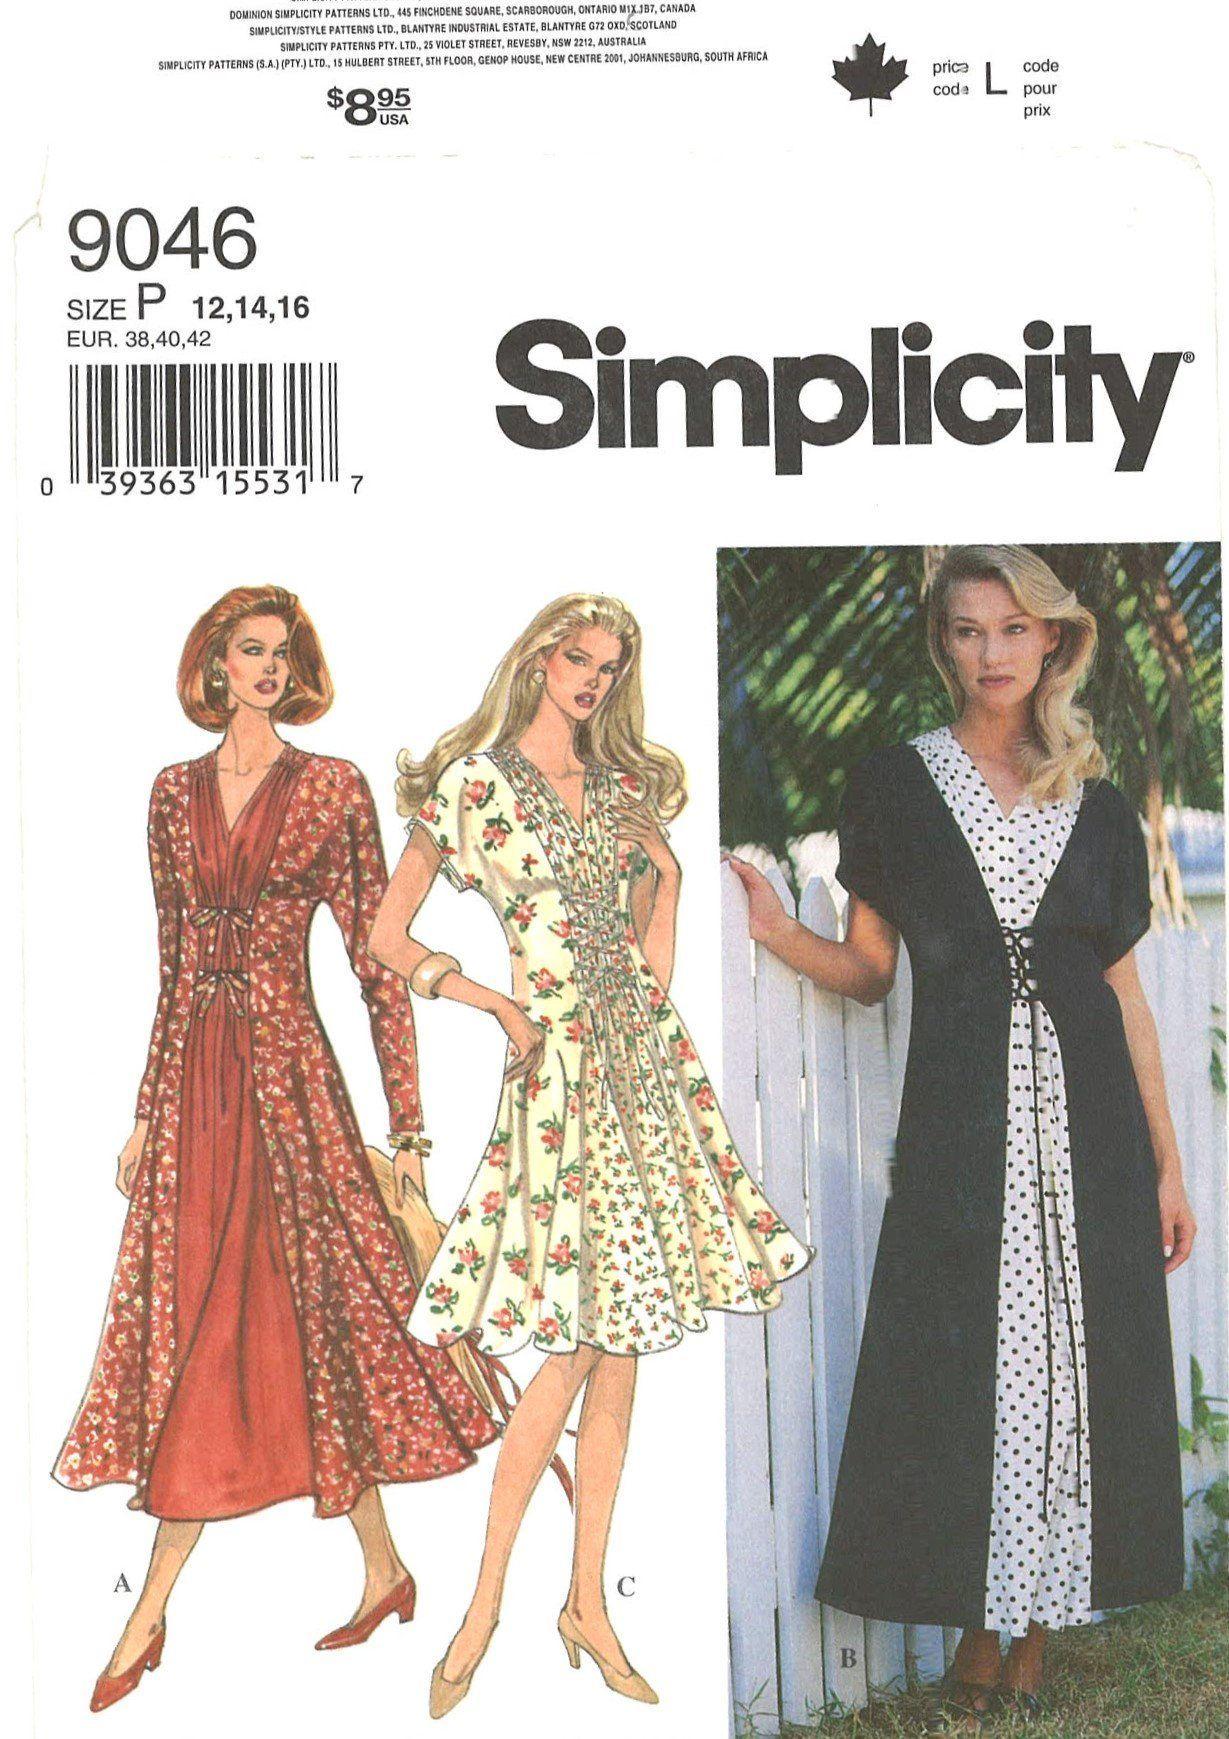 Simplicity 9046 Misses Princess Seam Dress Sewing Pattern